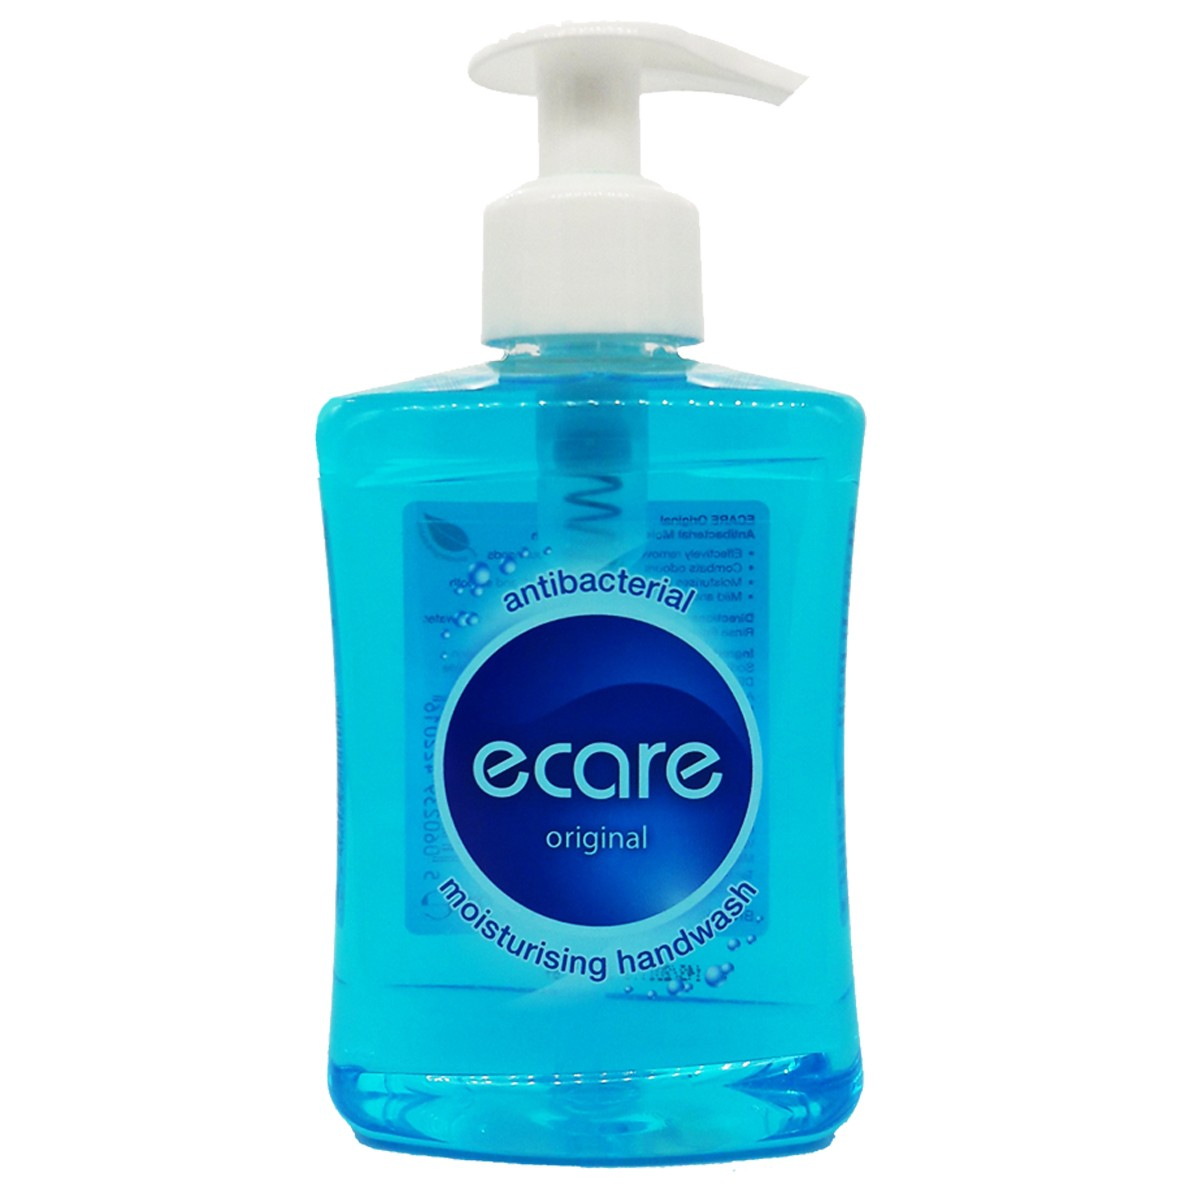 eCare Anti Bacterial Moisturising Handwash 300ml